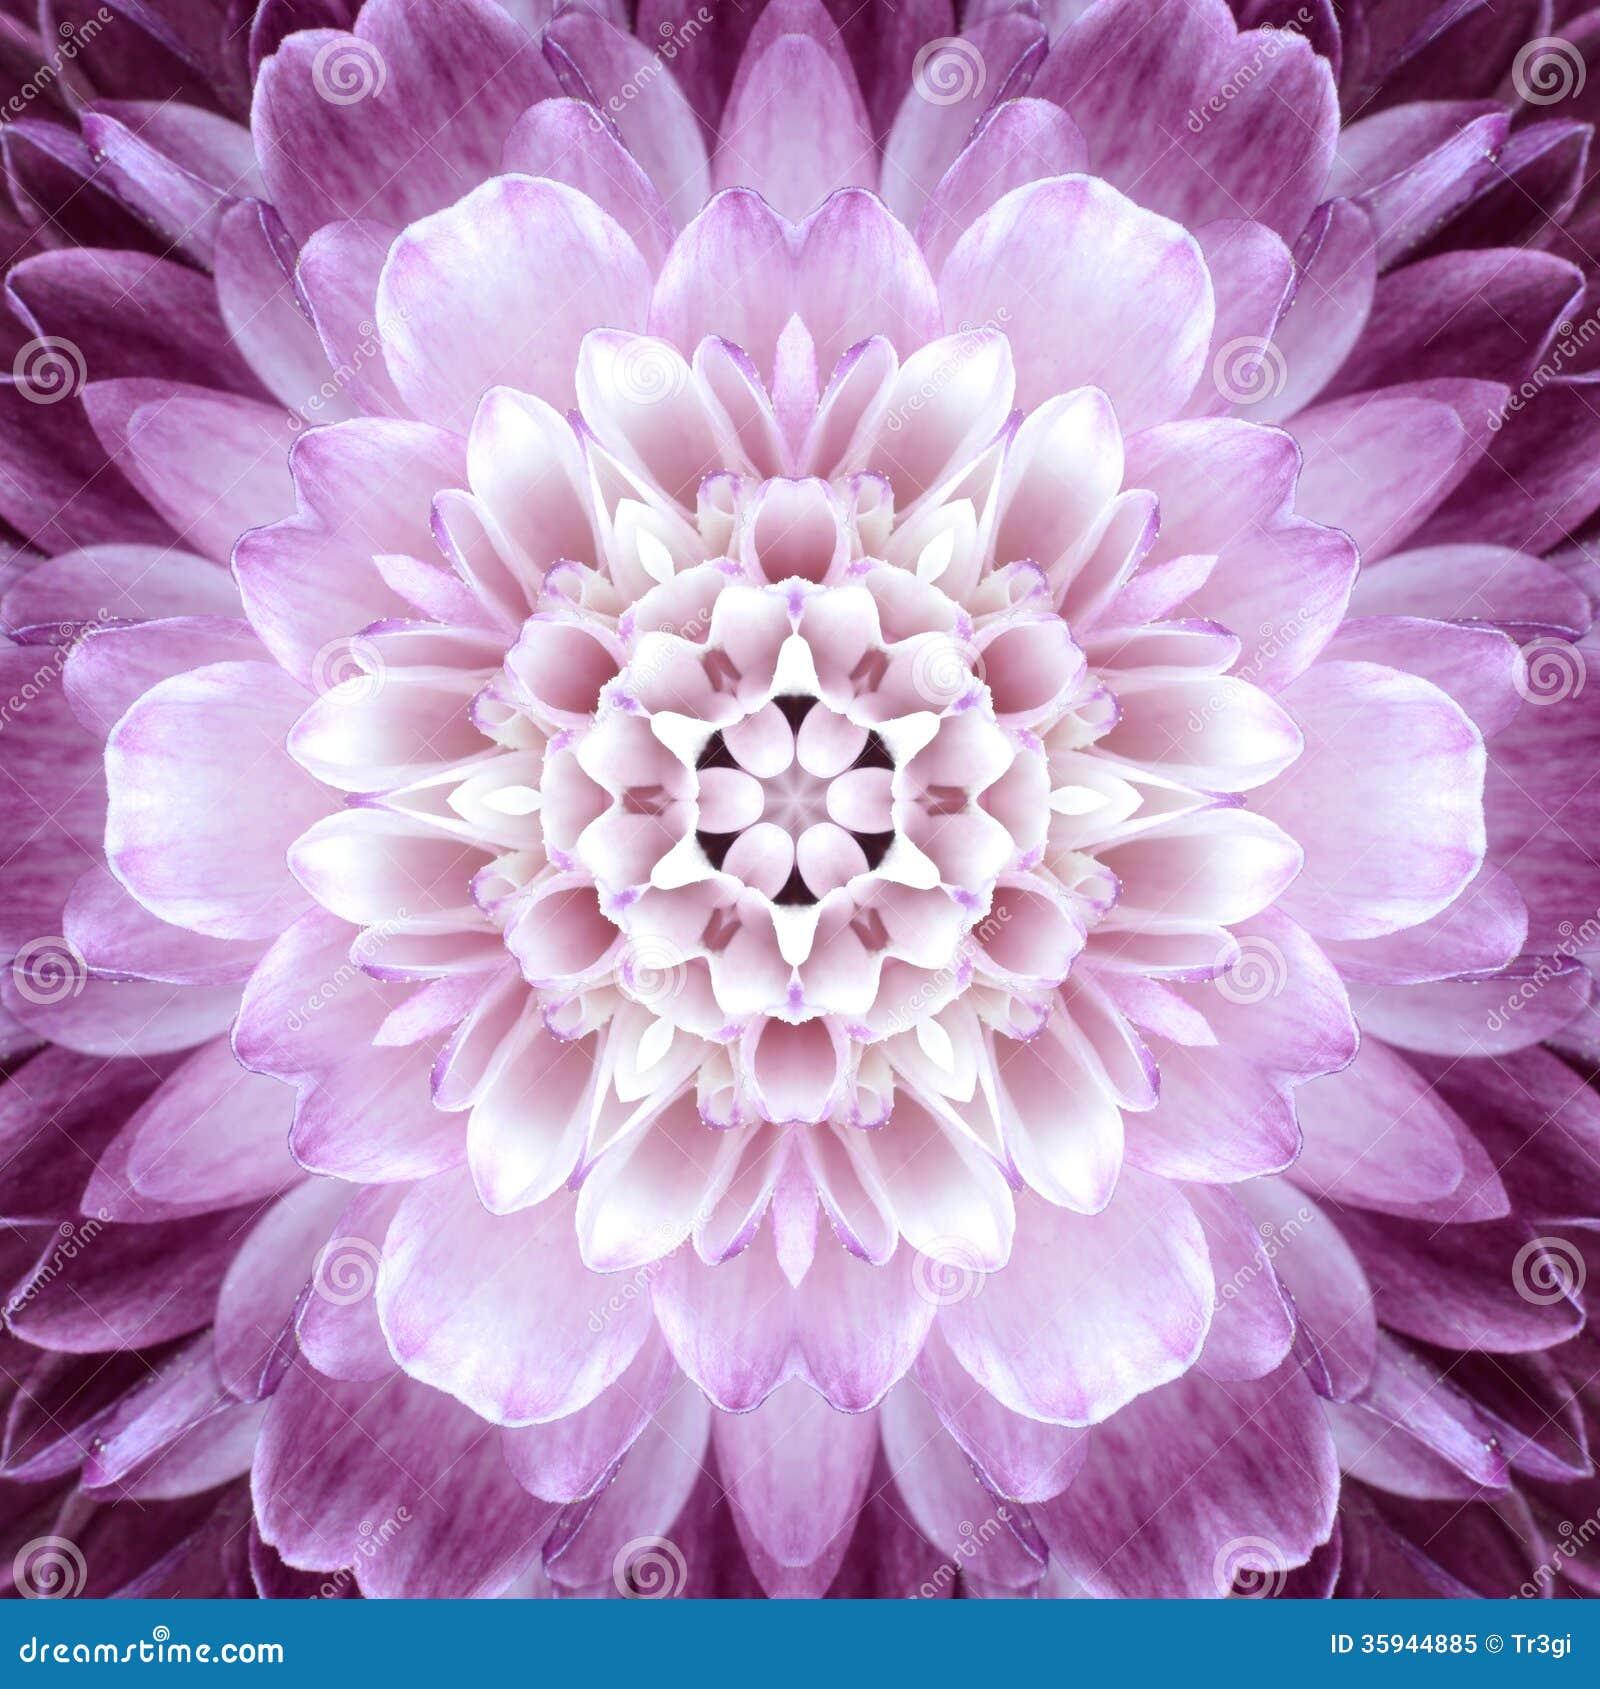 Centro concéntrico rosado de la flor. Diseño de Mandala Kaleidoscopic